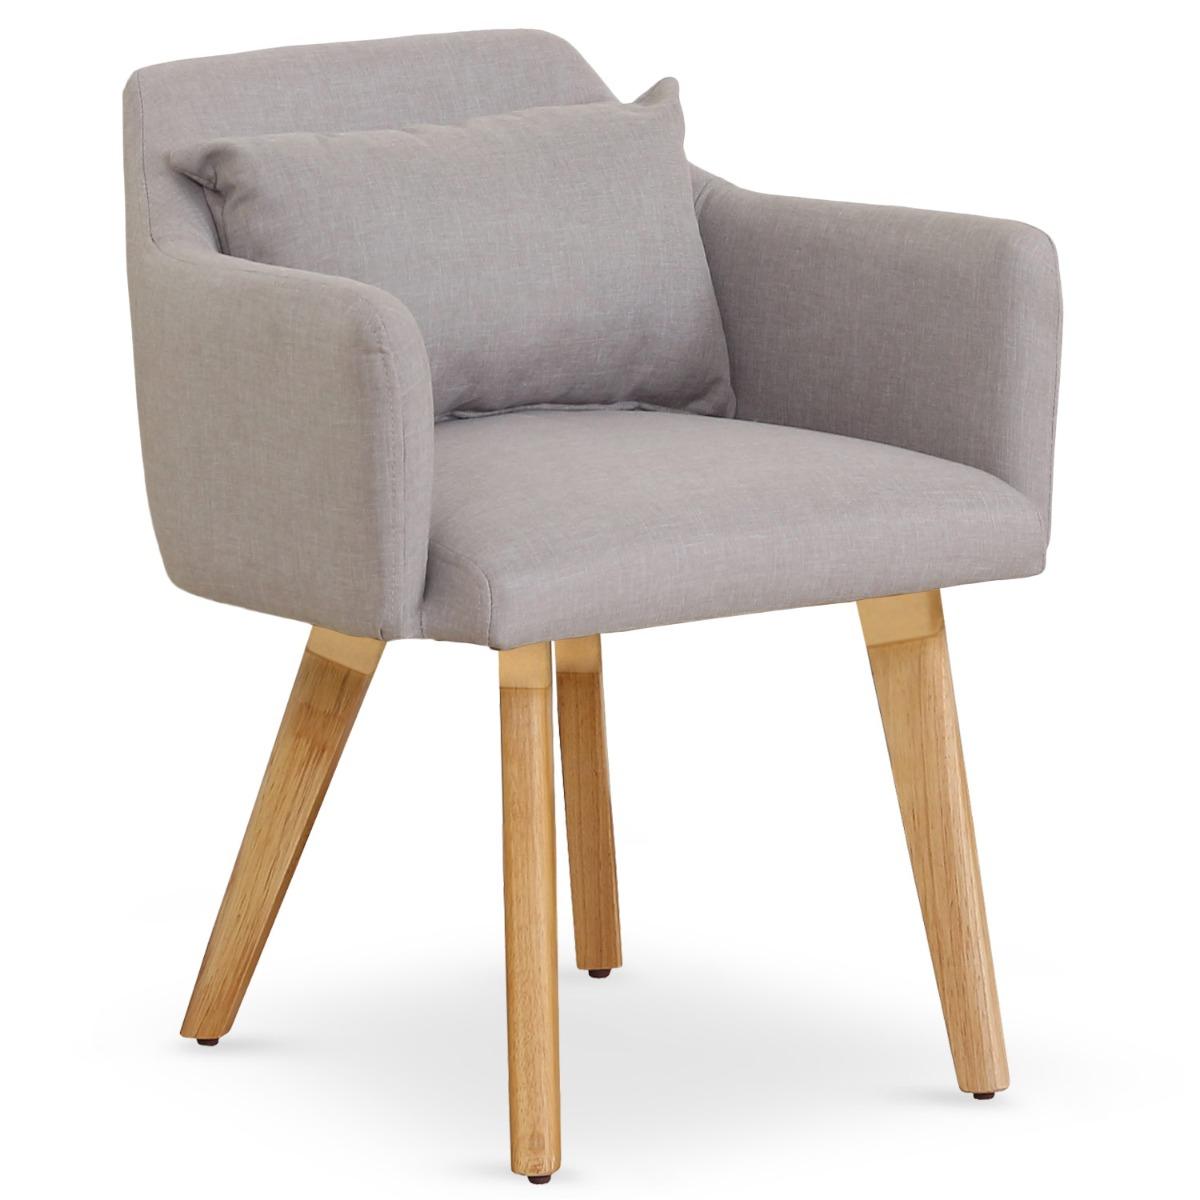 Chaise / Fauteuil scandinave Gybson Tissu Beige